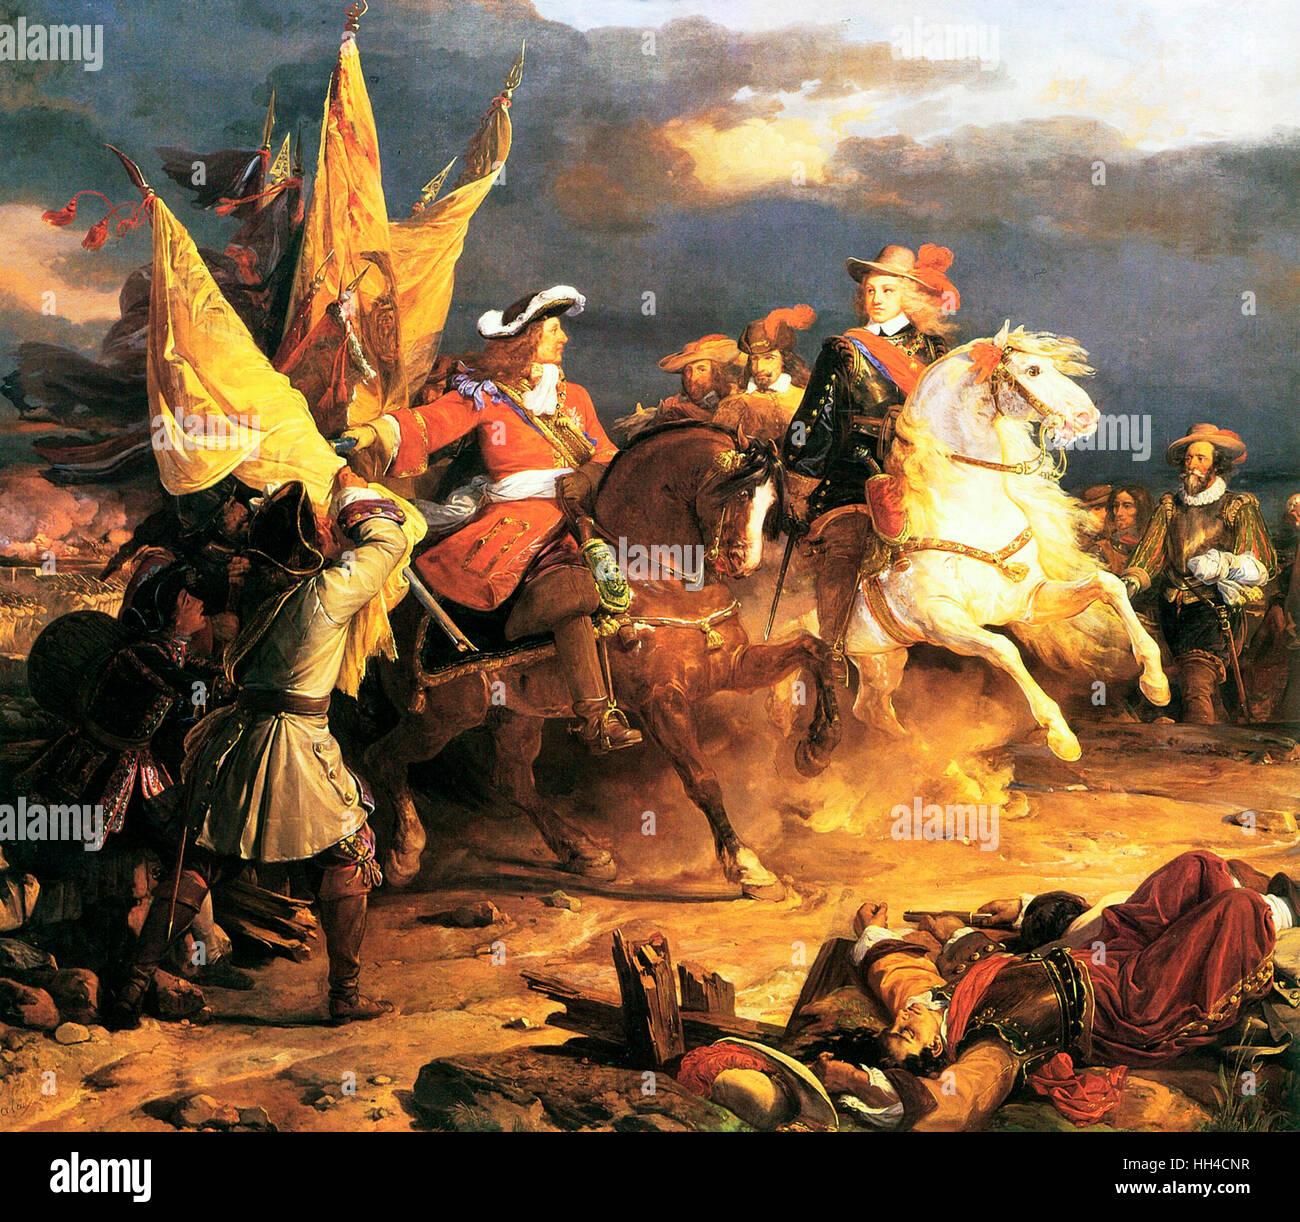 Battle of Villaviciosa during The War of the Spanish Succession (1701–1714) was a major European conflict of the early 18th century, Battle of Villaviciosa, Louis Joseph, Duke of Vendôme and Philip V of Spain Stock Photo